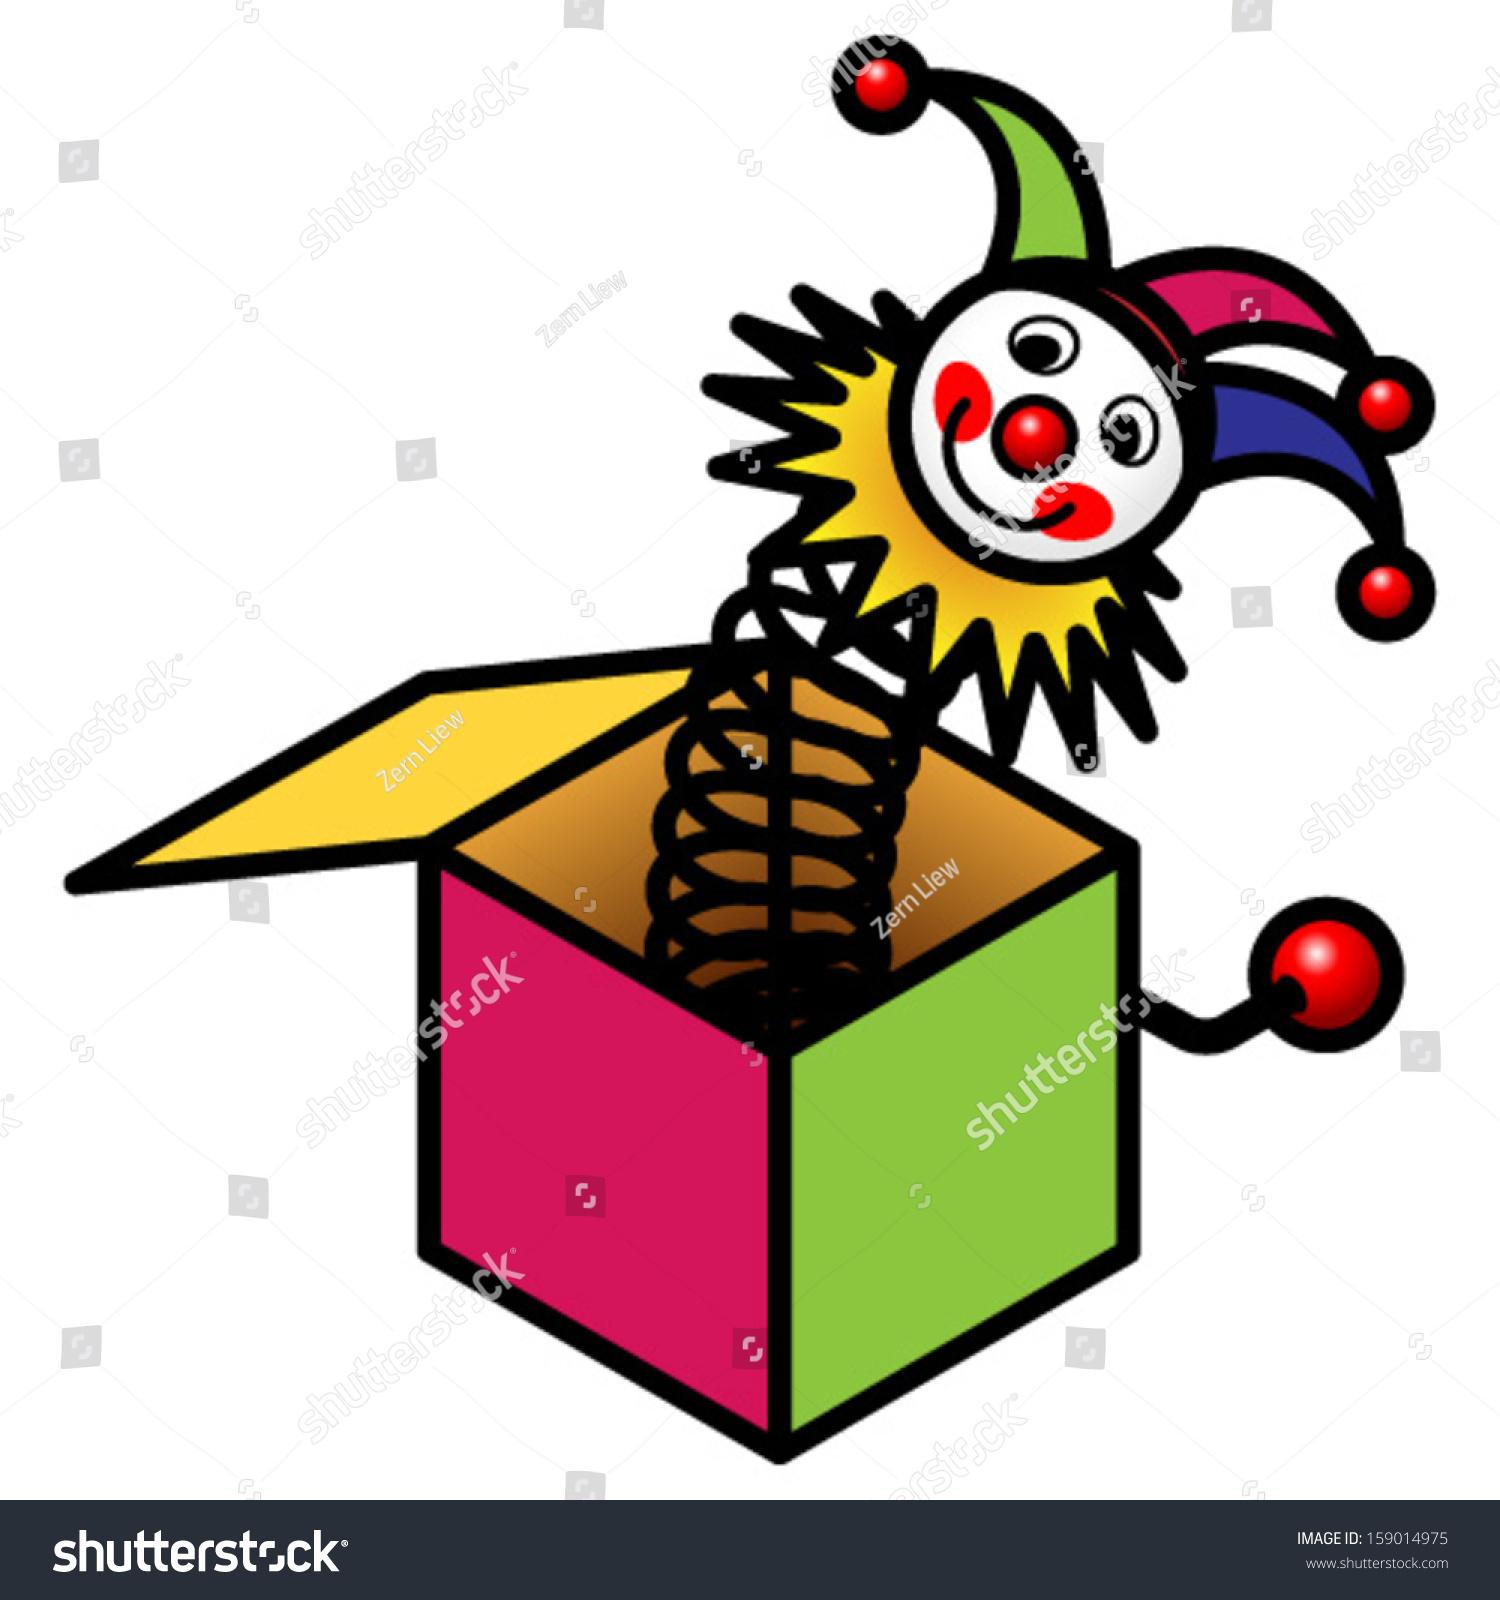 Jack Box Toy Stock Vector 159014975 - Shutterstock